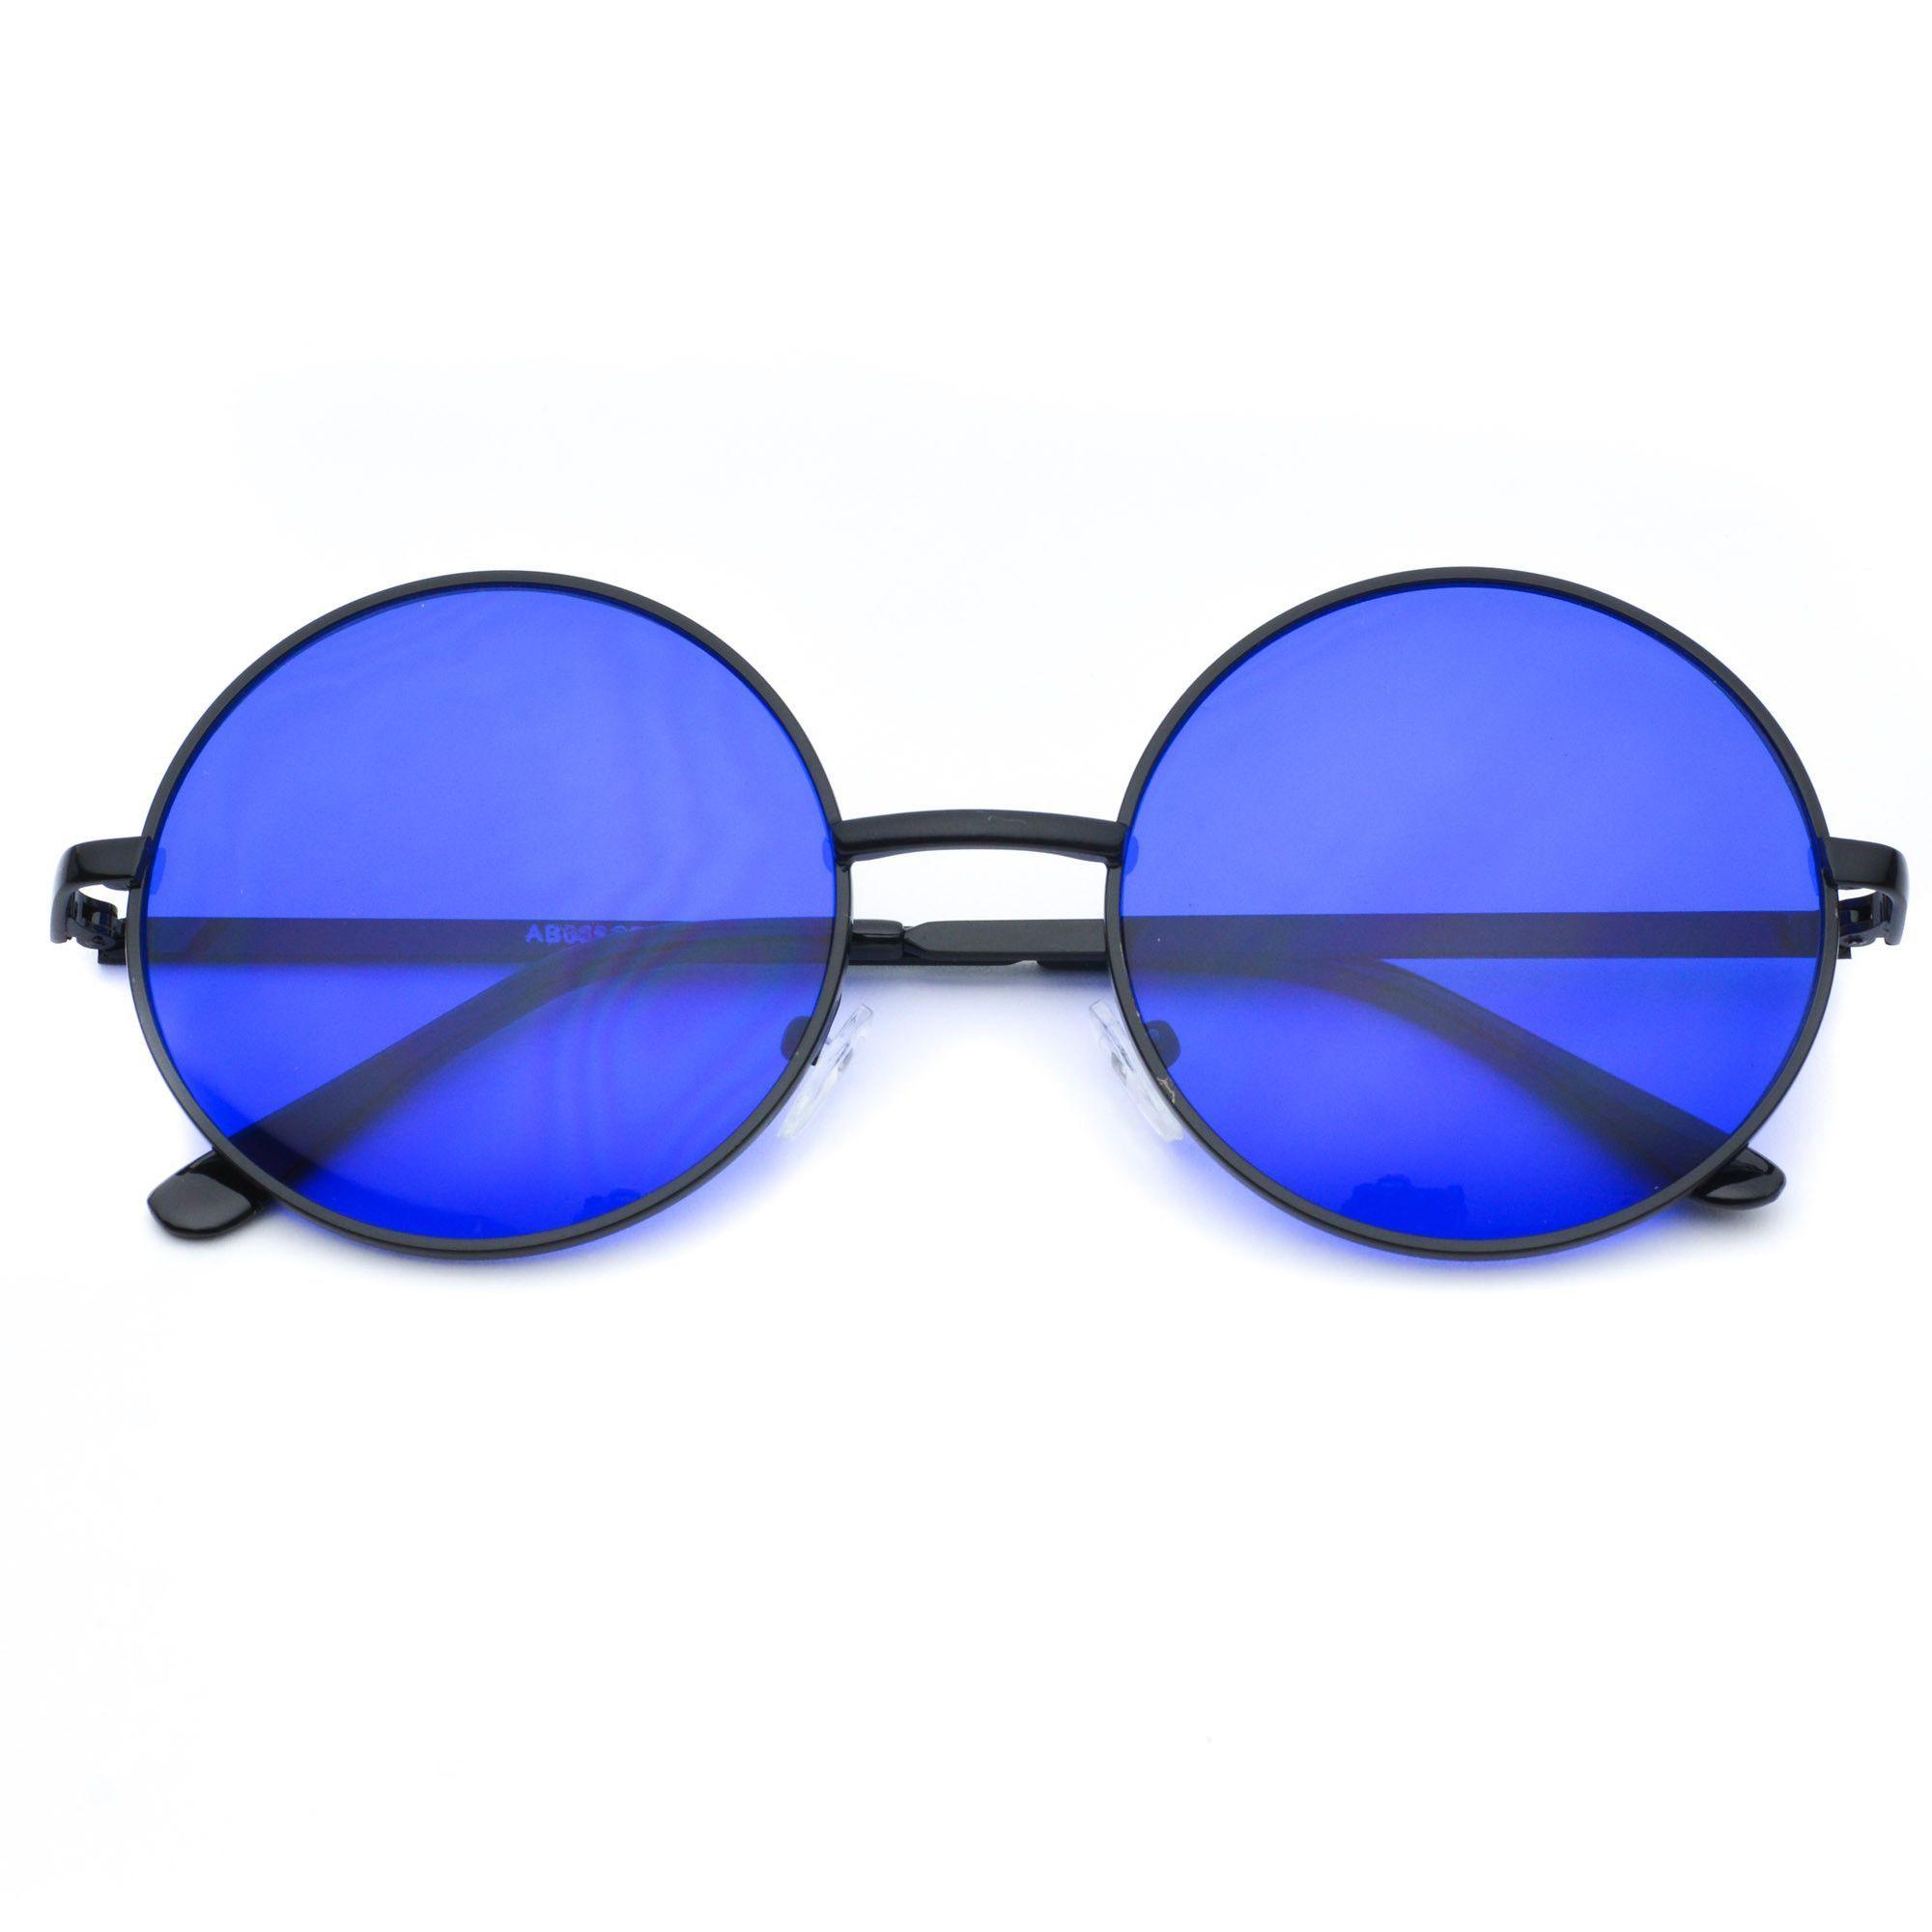 Payton Colorful Round Retro Sunglasses